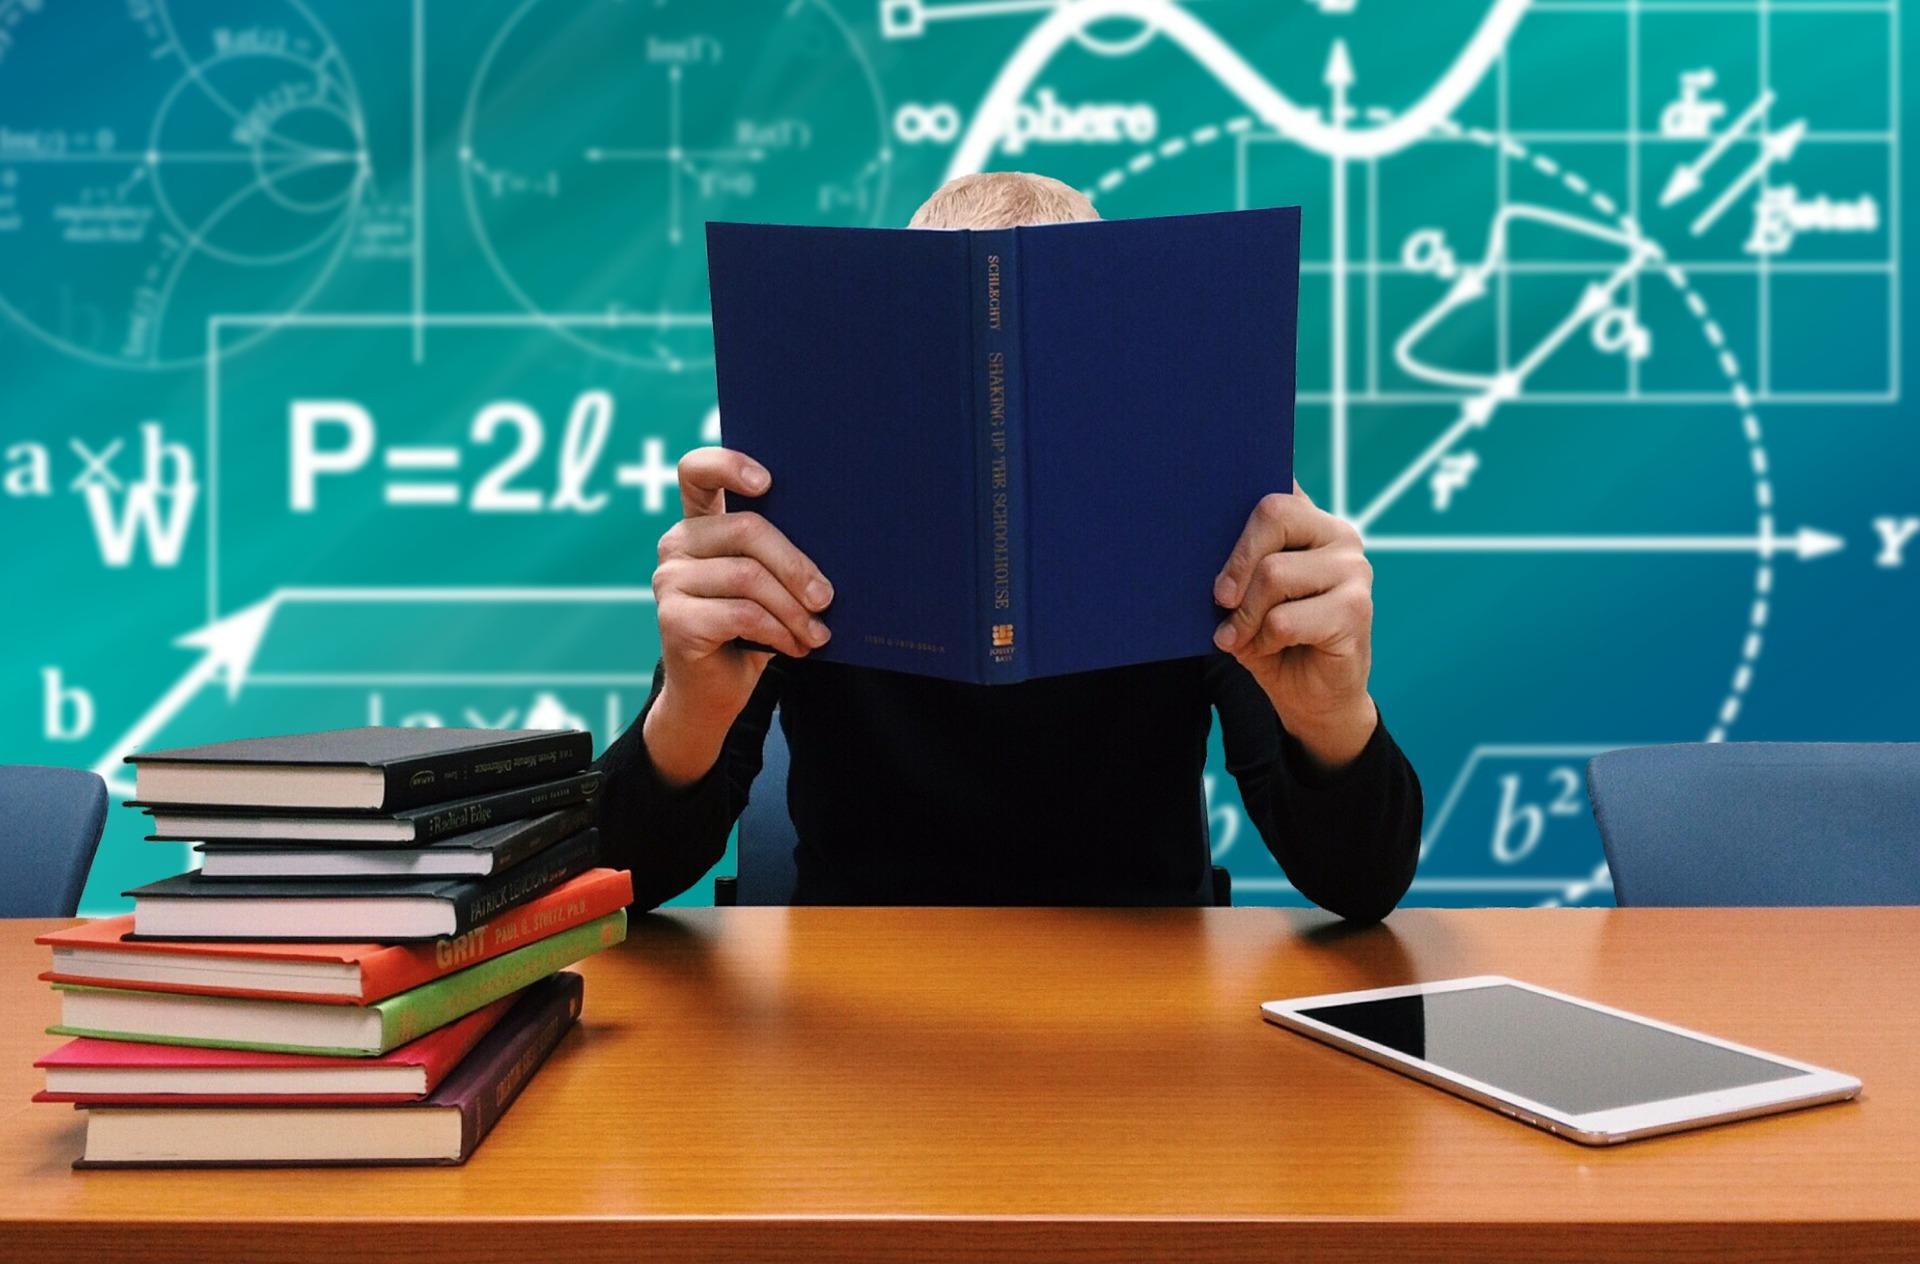 Școala online – avantaje şi dezavantaje